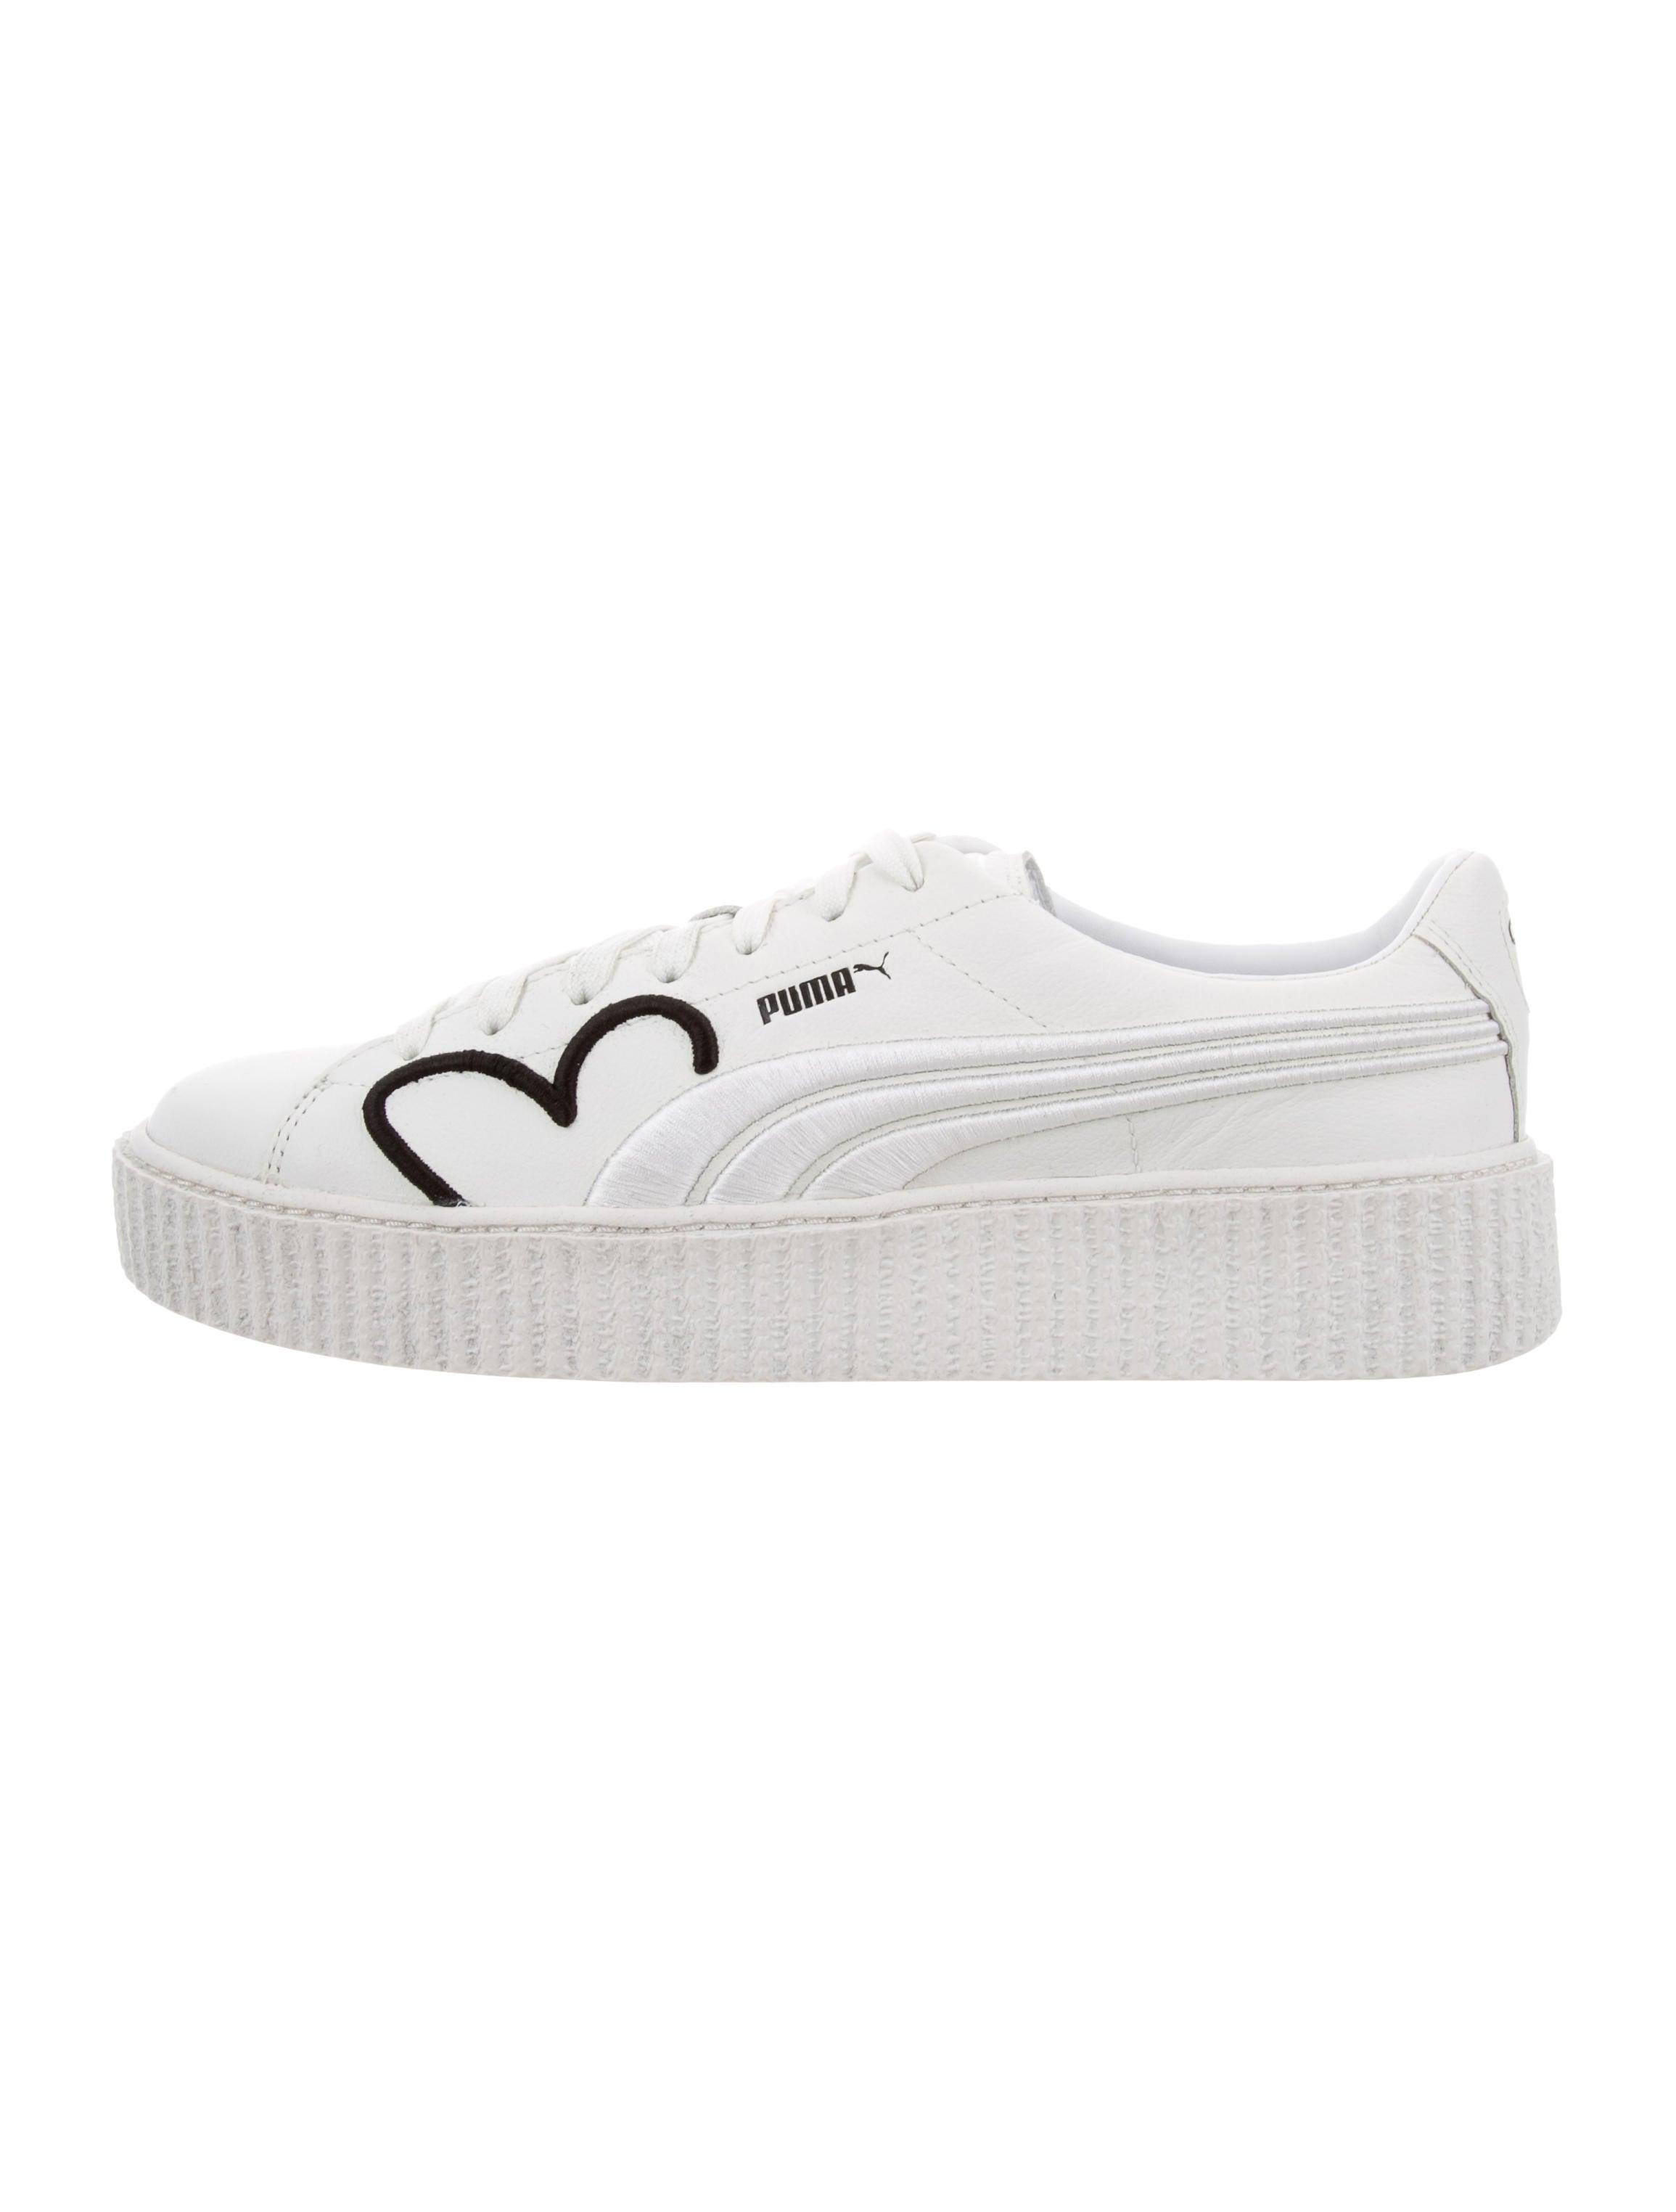 eceee2ba822 Fenty x Puma Clara Lionel Creeper Sneakers - Shoes - WPMFY20783 ...